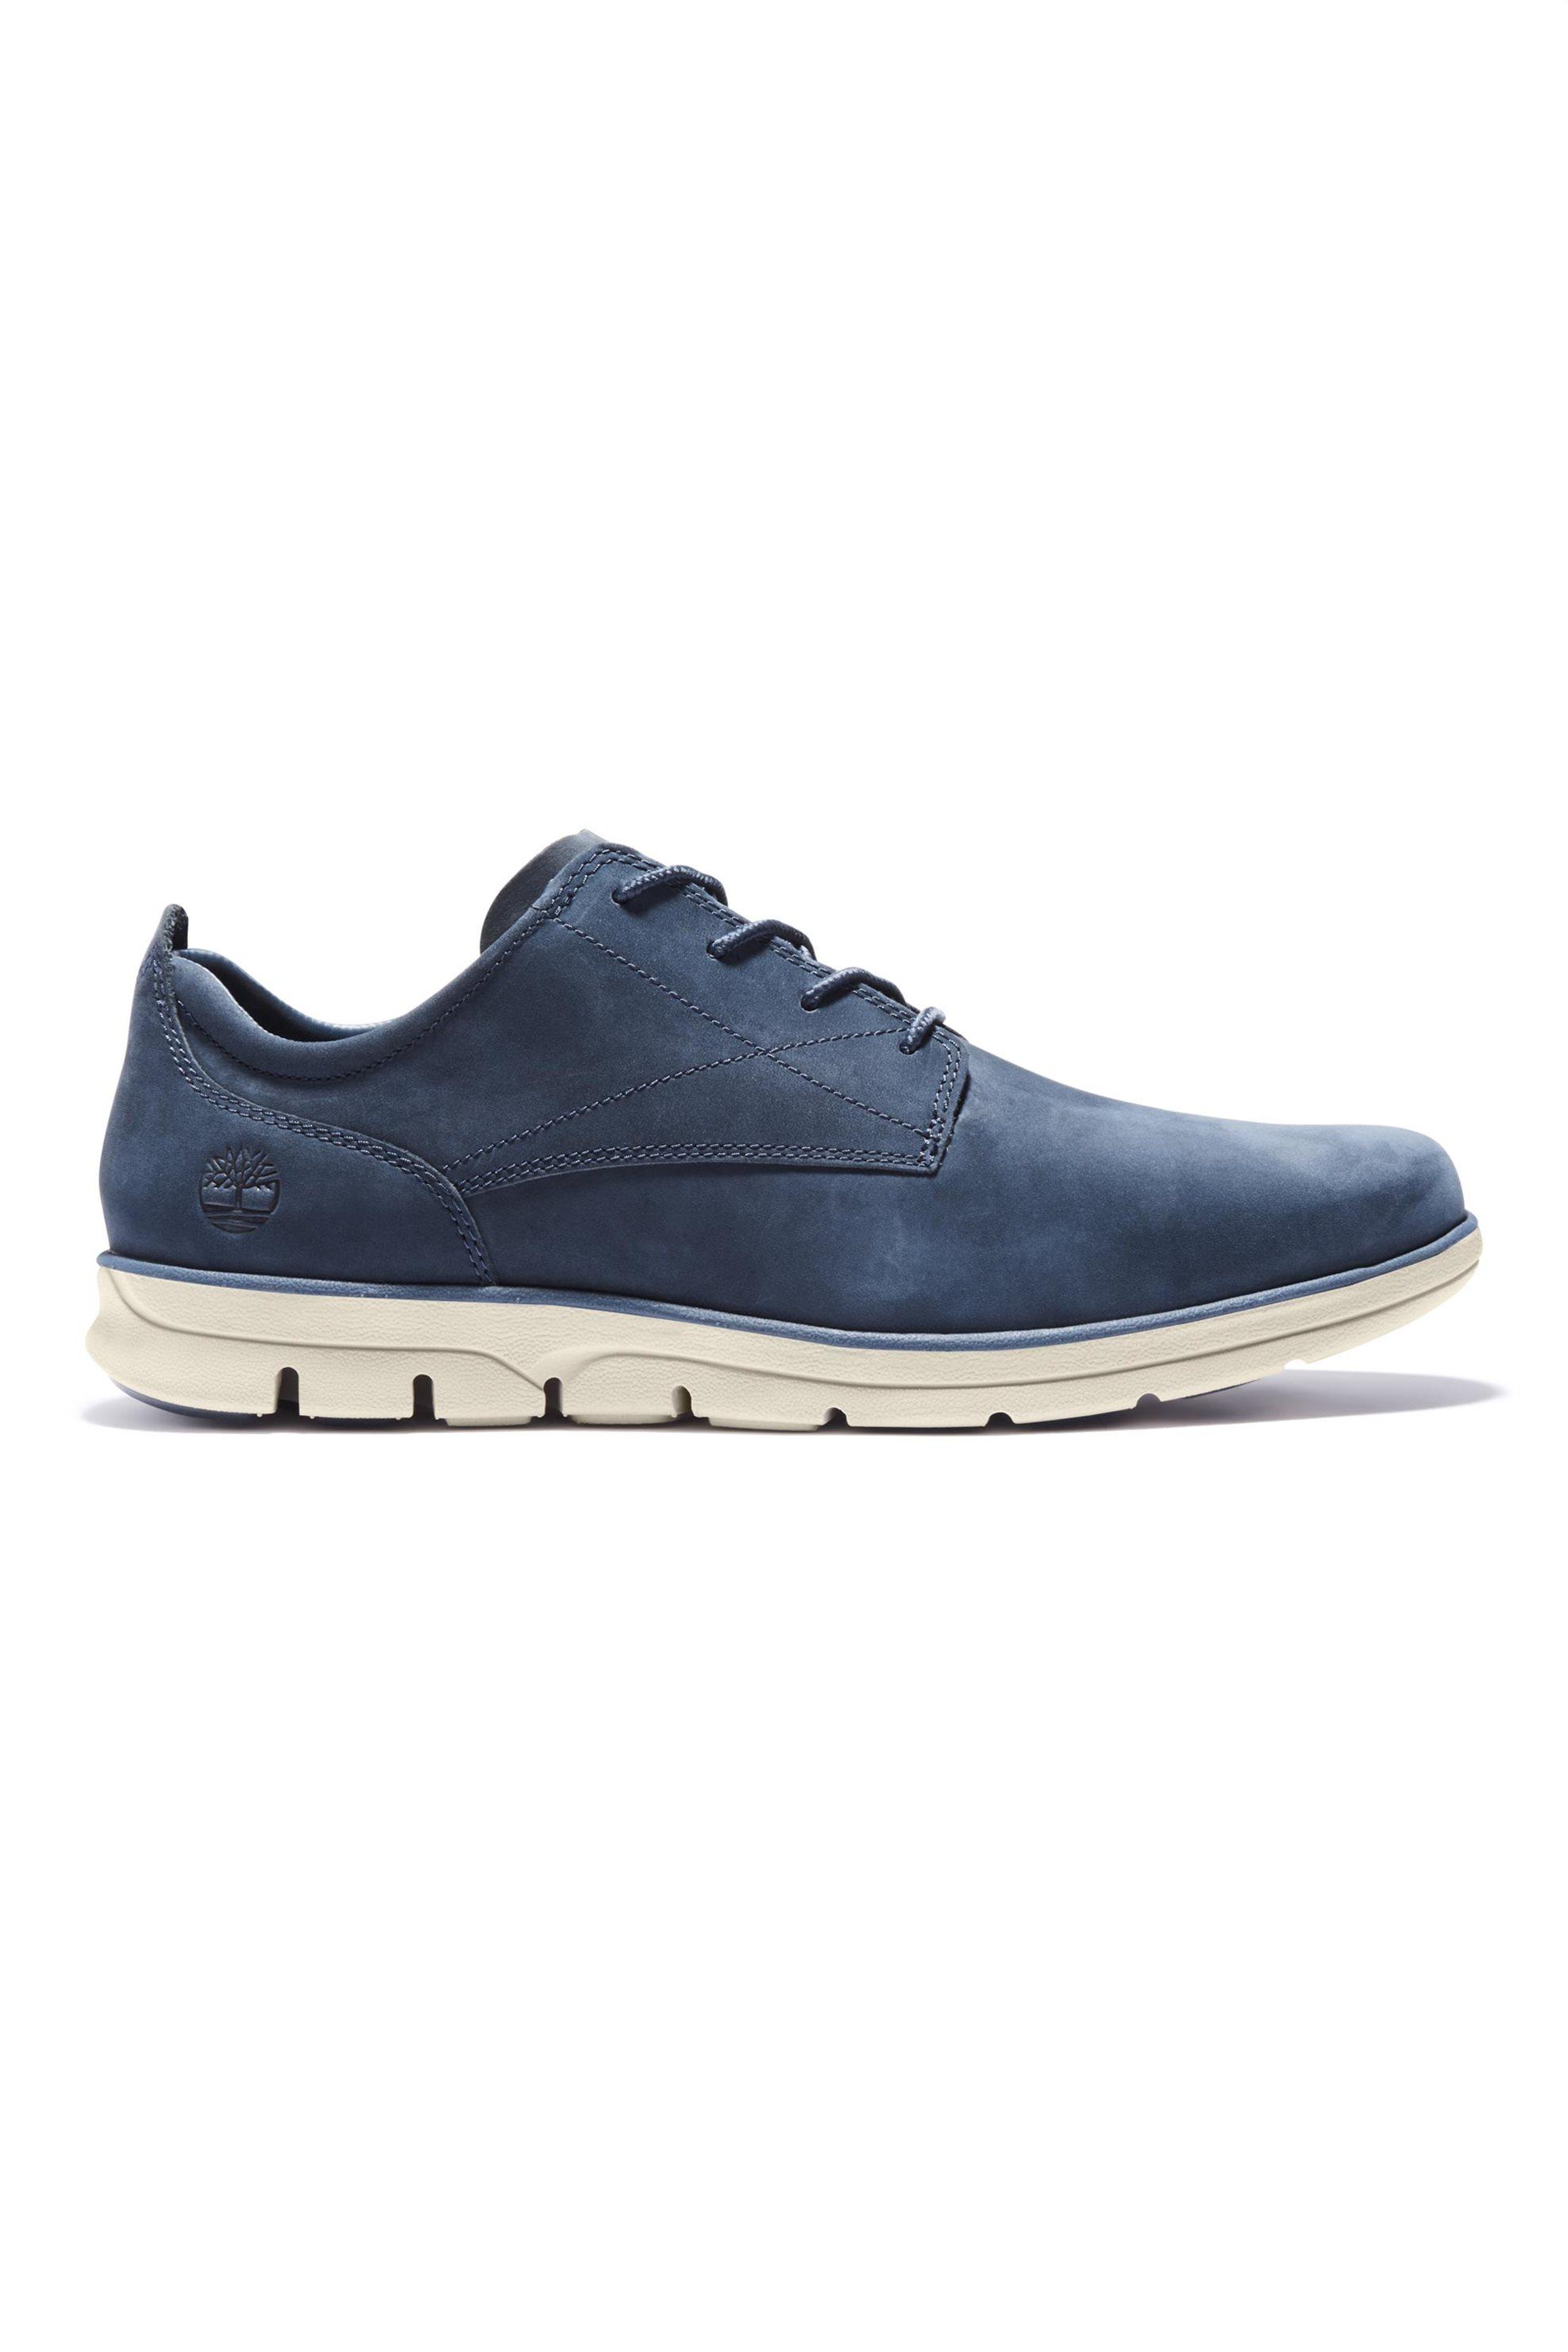 "Timberland ανδρικά παπούτσια ""Bradstreet Plain Toe"" – TB0A2C6N0191 – Μπλε Σκούρο"